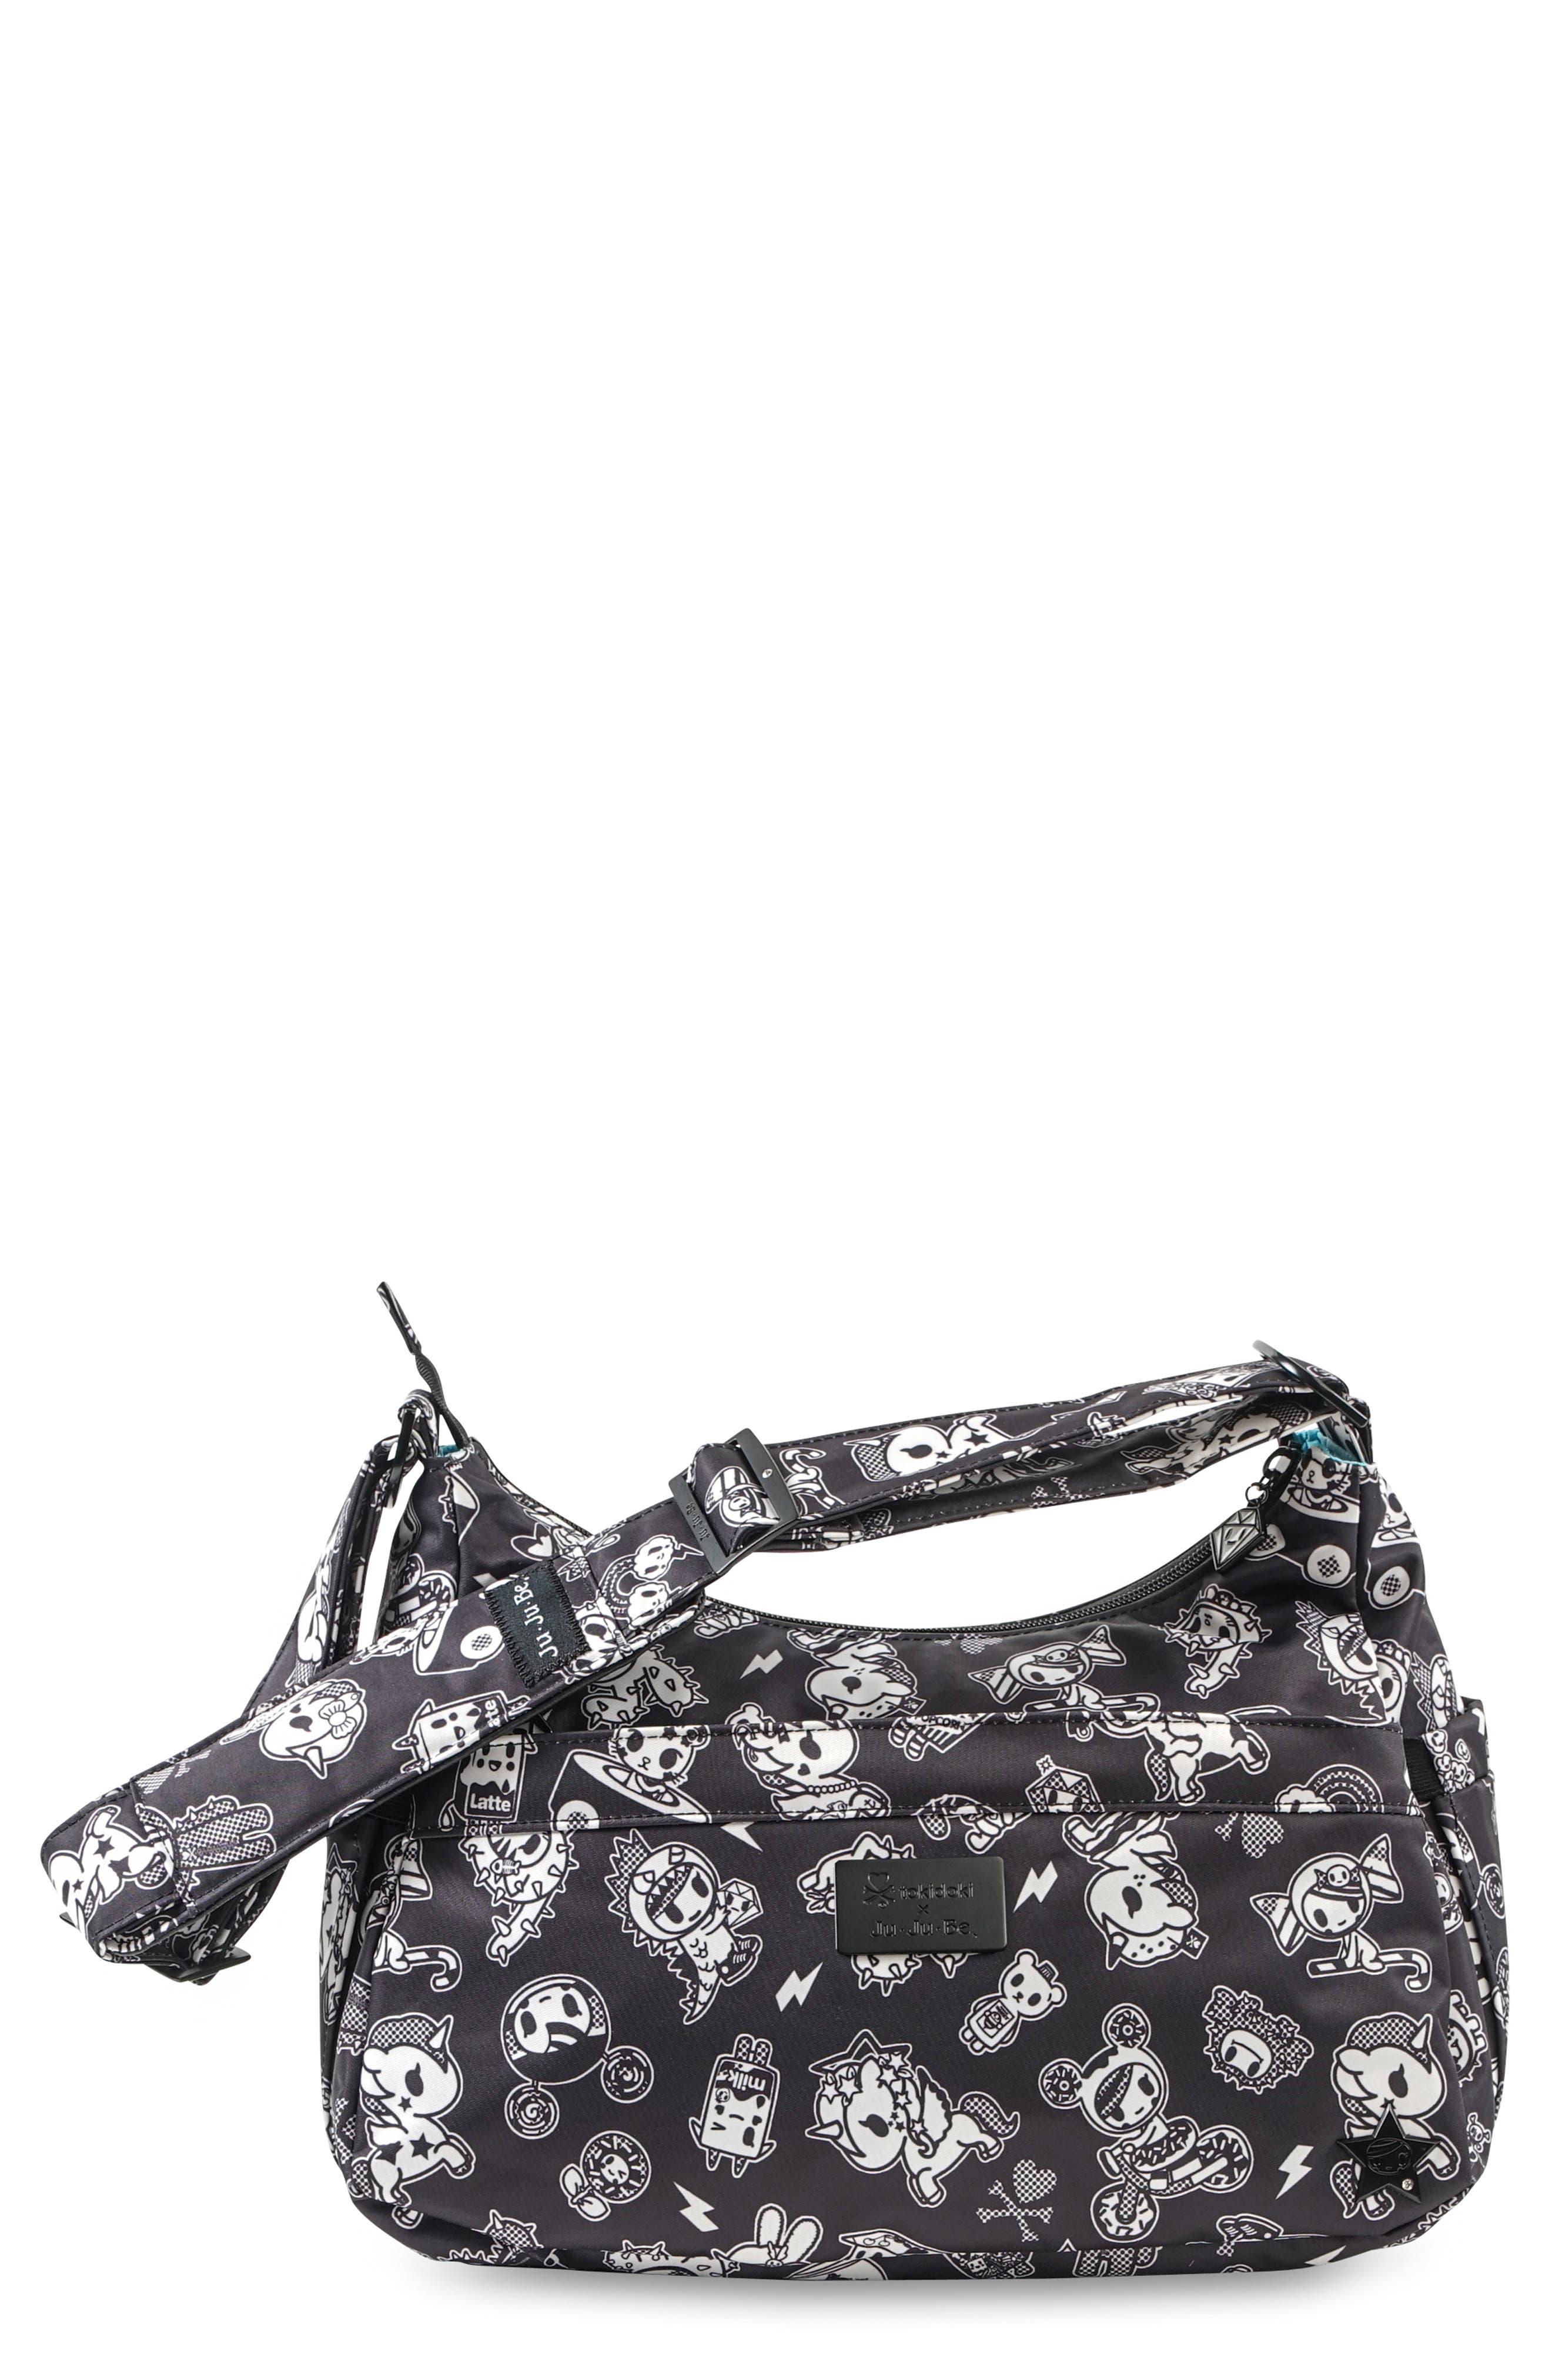 Infant Tokidoki X JuJuBe Hobobe Diaper Bag  Black